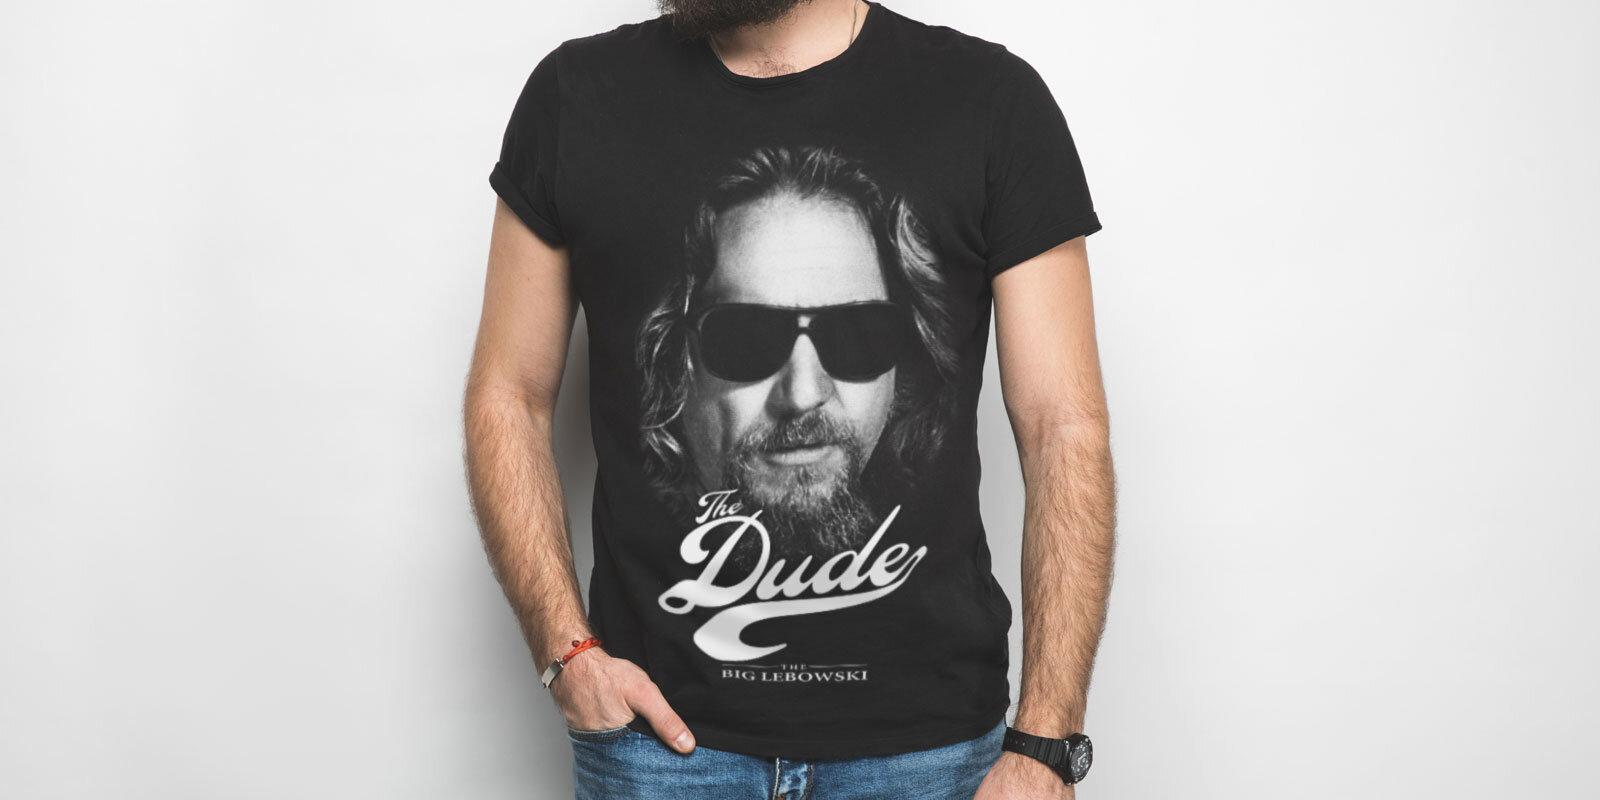 https://www.shirtstore.dk/pub_docs/files/Man/MAN-HalfLeft-Lebowski.jpg